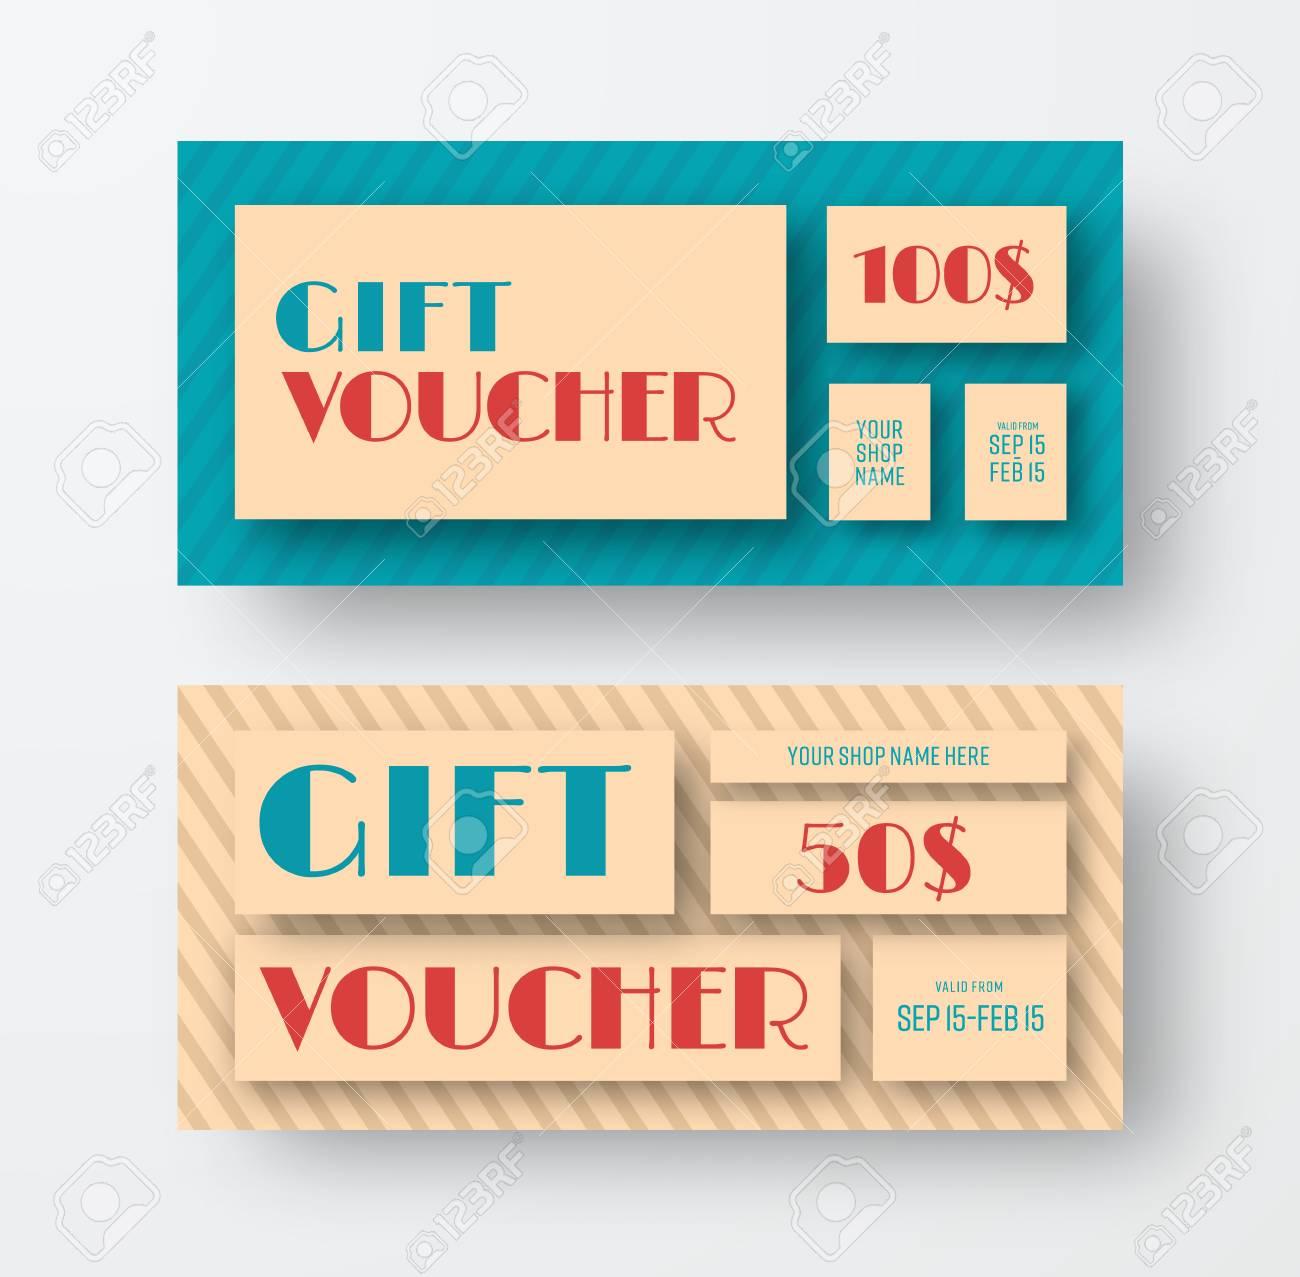 vector vintage gift voucher design template coupon in retro